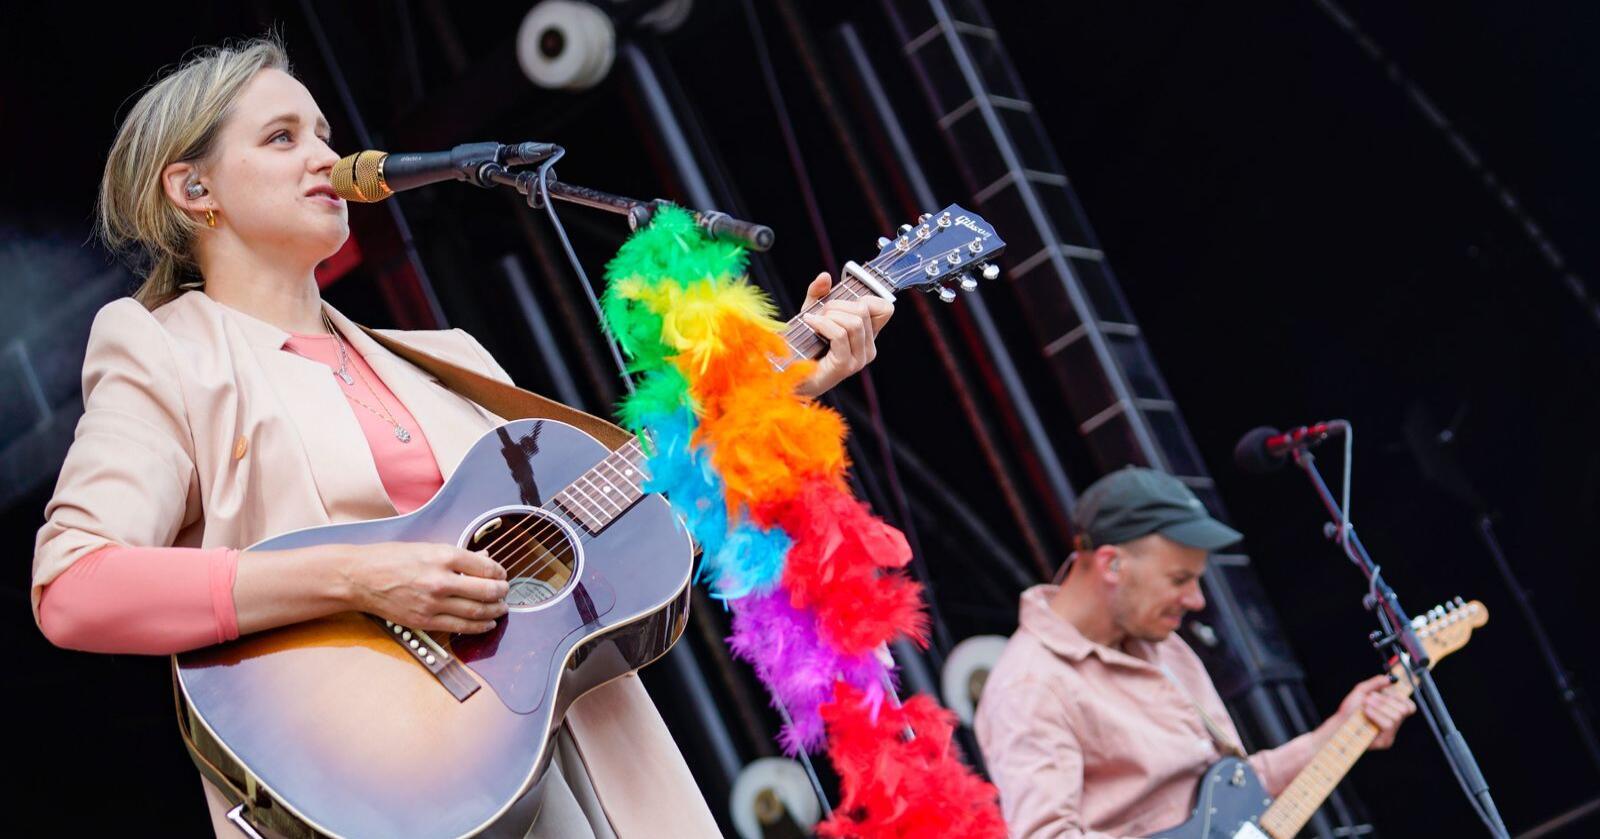 Norsk på øret: Her er musiker Frida Ånnevik på scenen under Fredvikafestivalen på Gjøvik. Foto: Heiko Junge / NTB